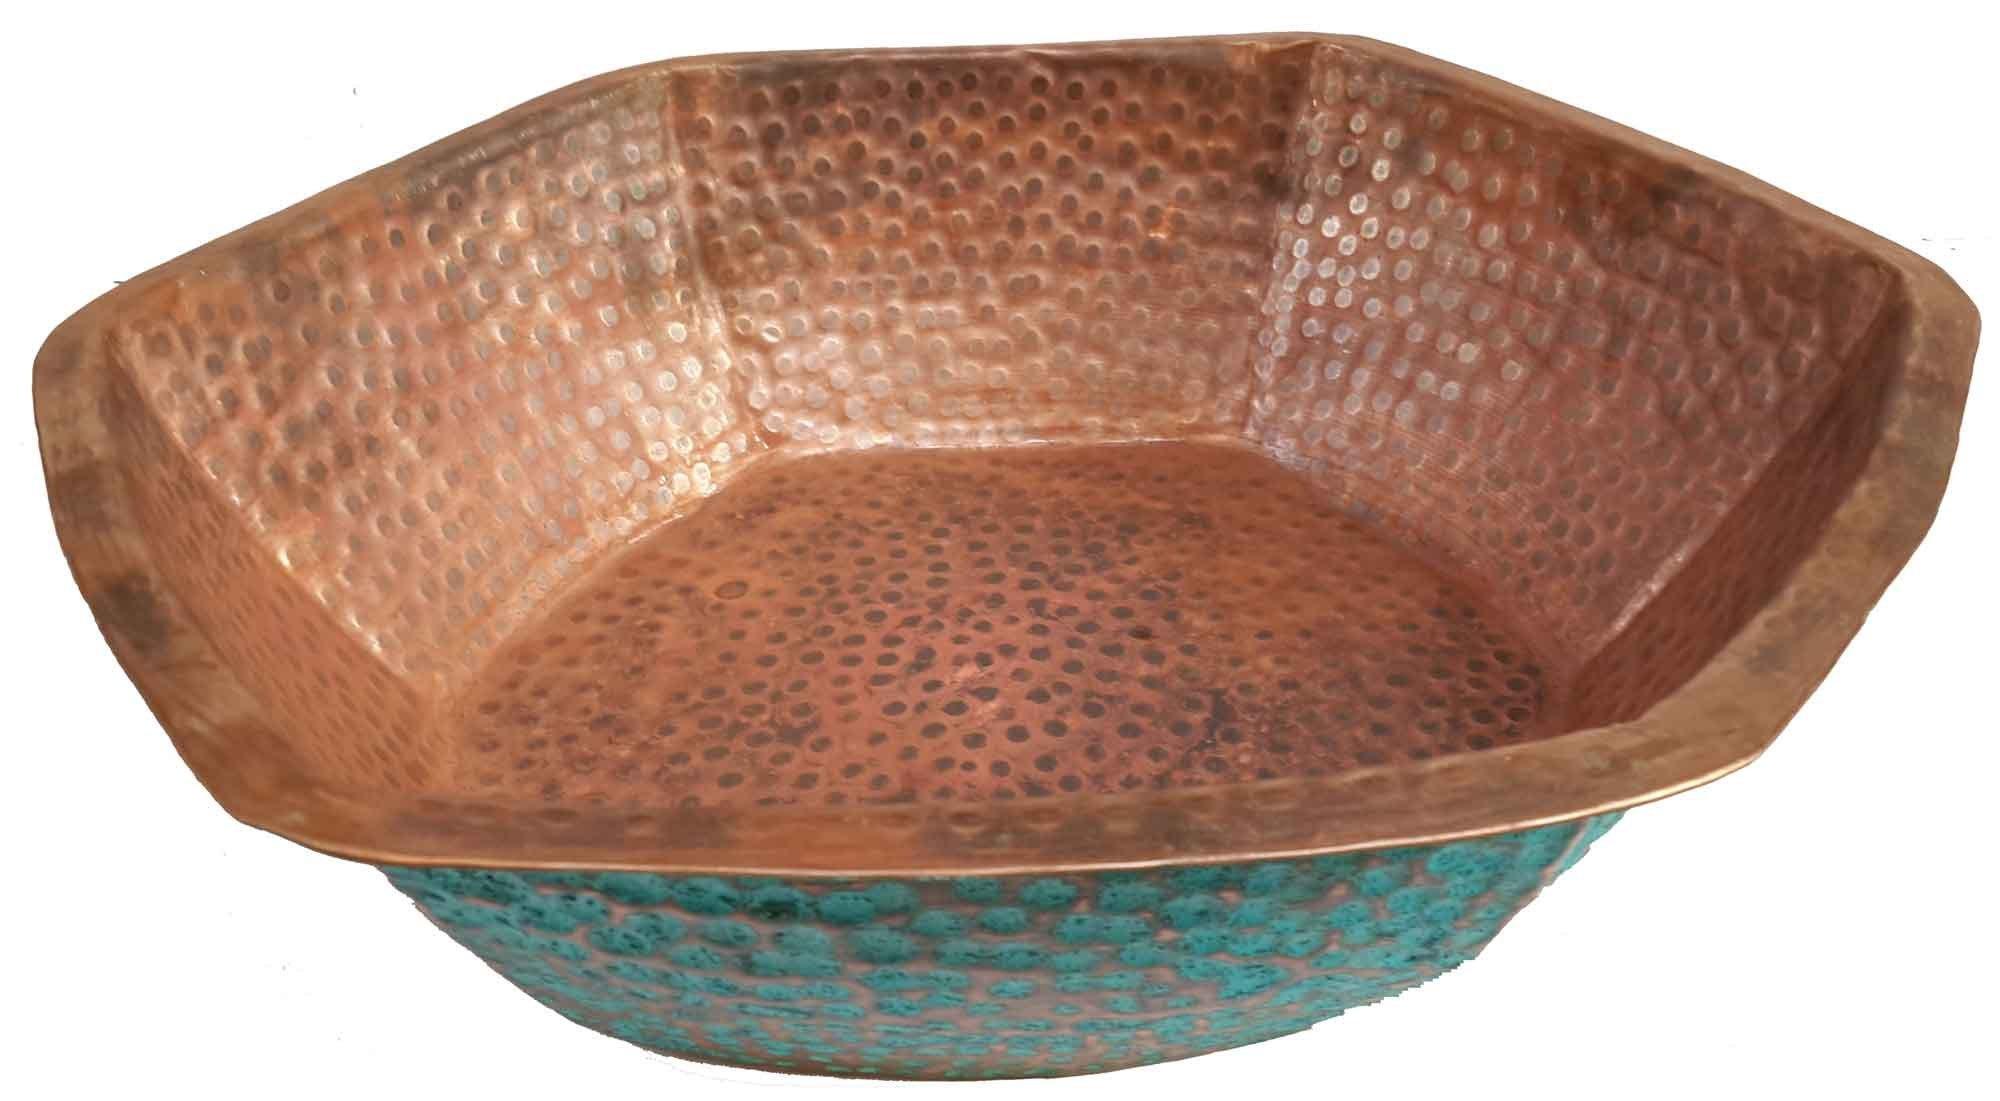 Egypt gift shops Hexagonal Verdigris Fire Burnt Foot Massage Bath Bucket Pedicure Spa Styling Salon Pedicure Bowl by Egypt Gift Shops